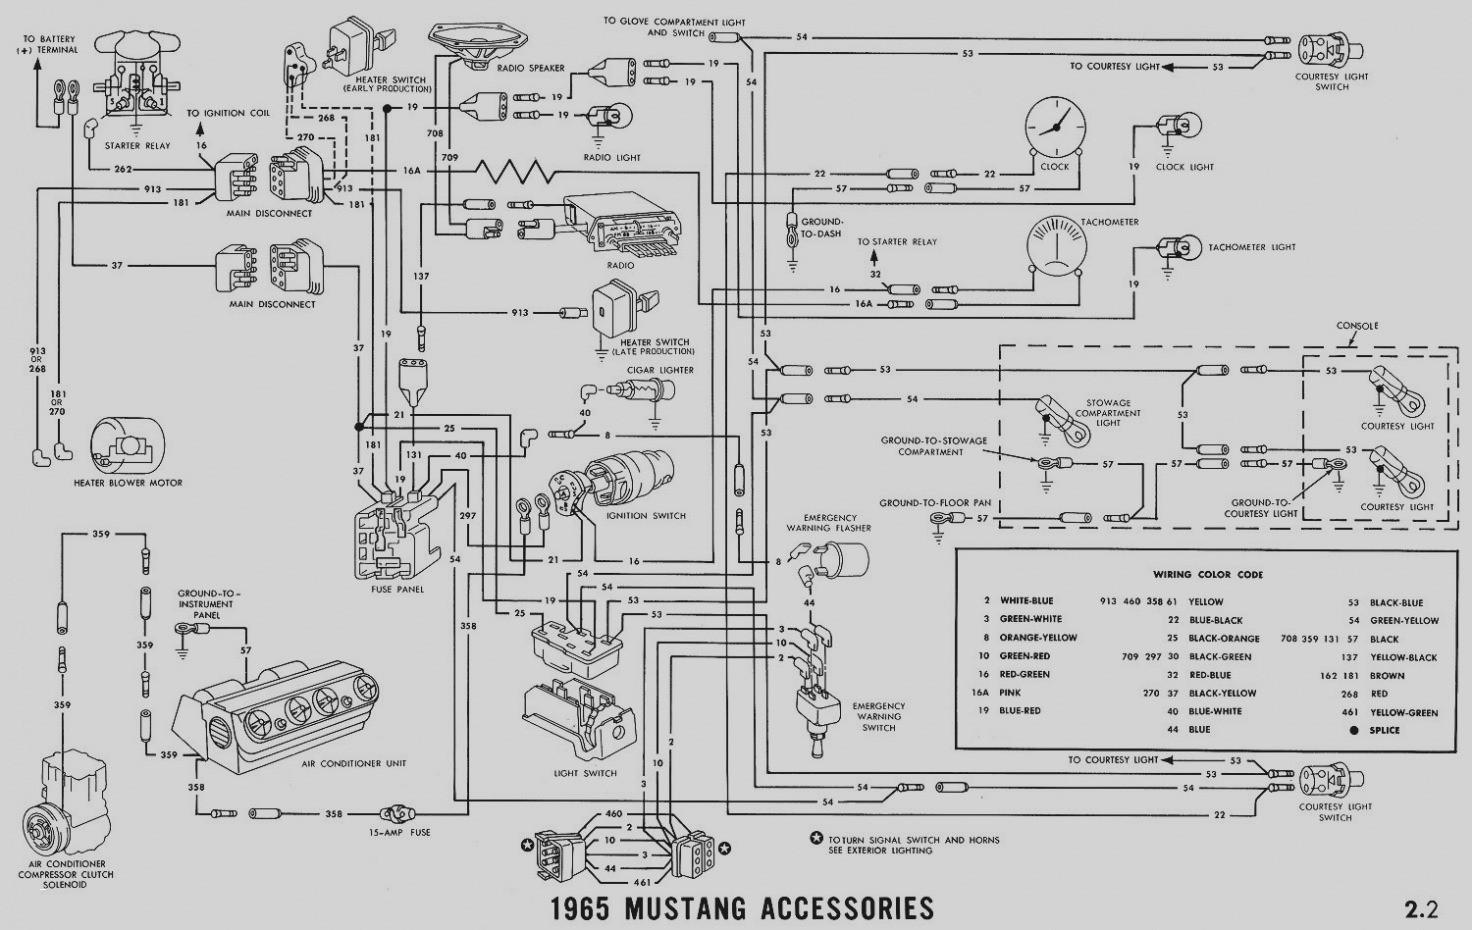 1965 mustang wiring diagram wiring diagram image rh mainetreasurechest com 1965 ford mustang wiring diagram 1965 mustang wiring diagram pdf